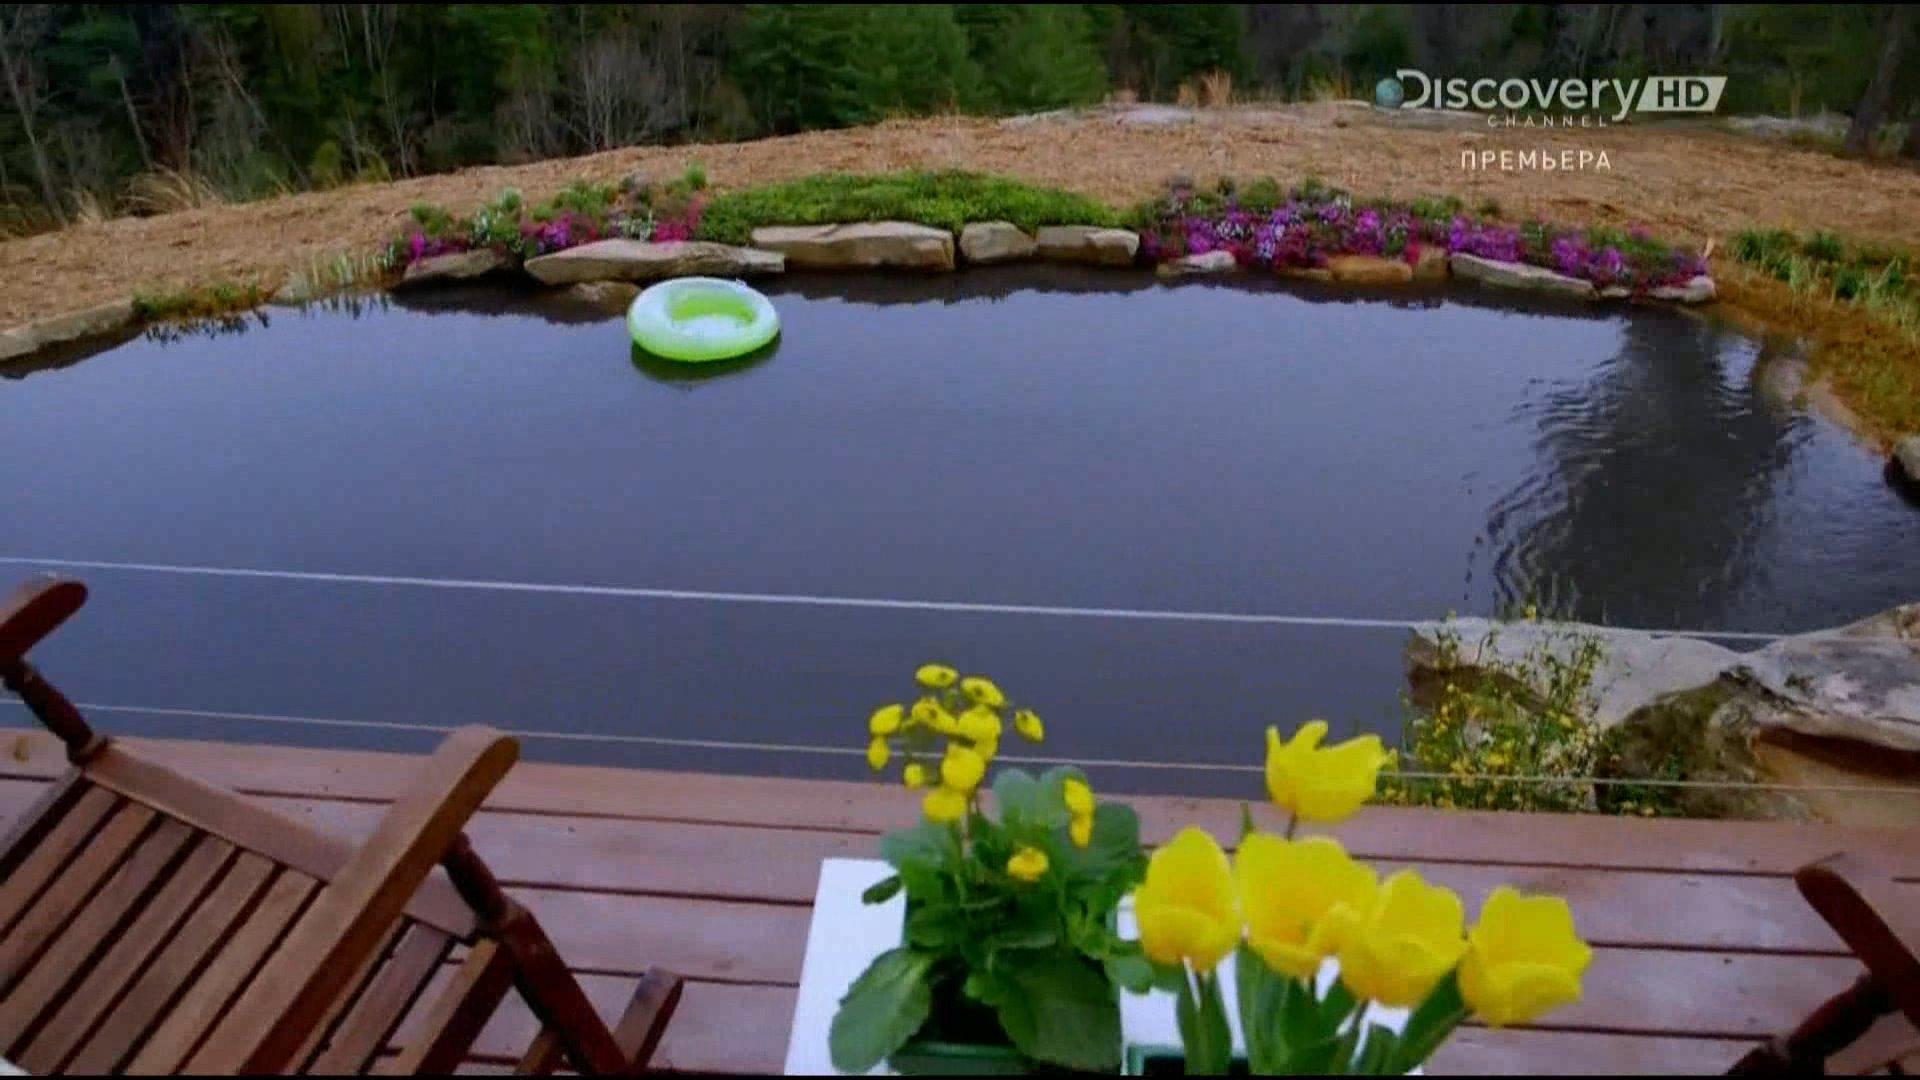 Discovery. Мастер по созданию бассейнов / The pool master (1-4 серии) (2014) HDTV 1080p